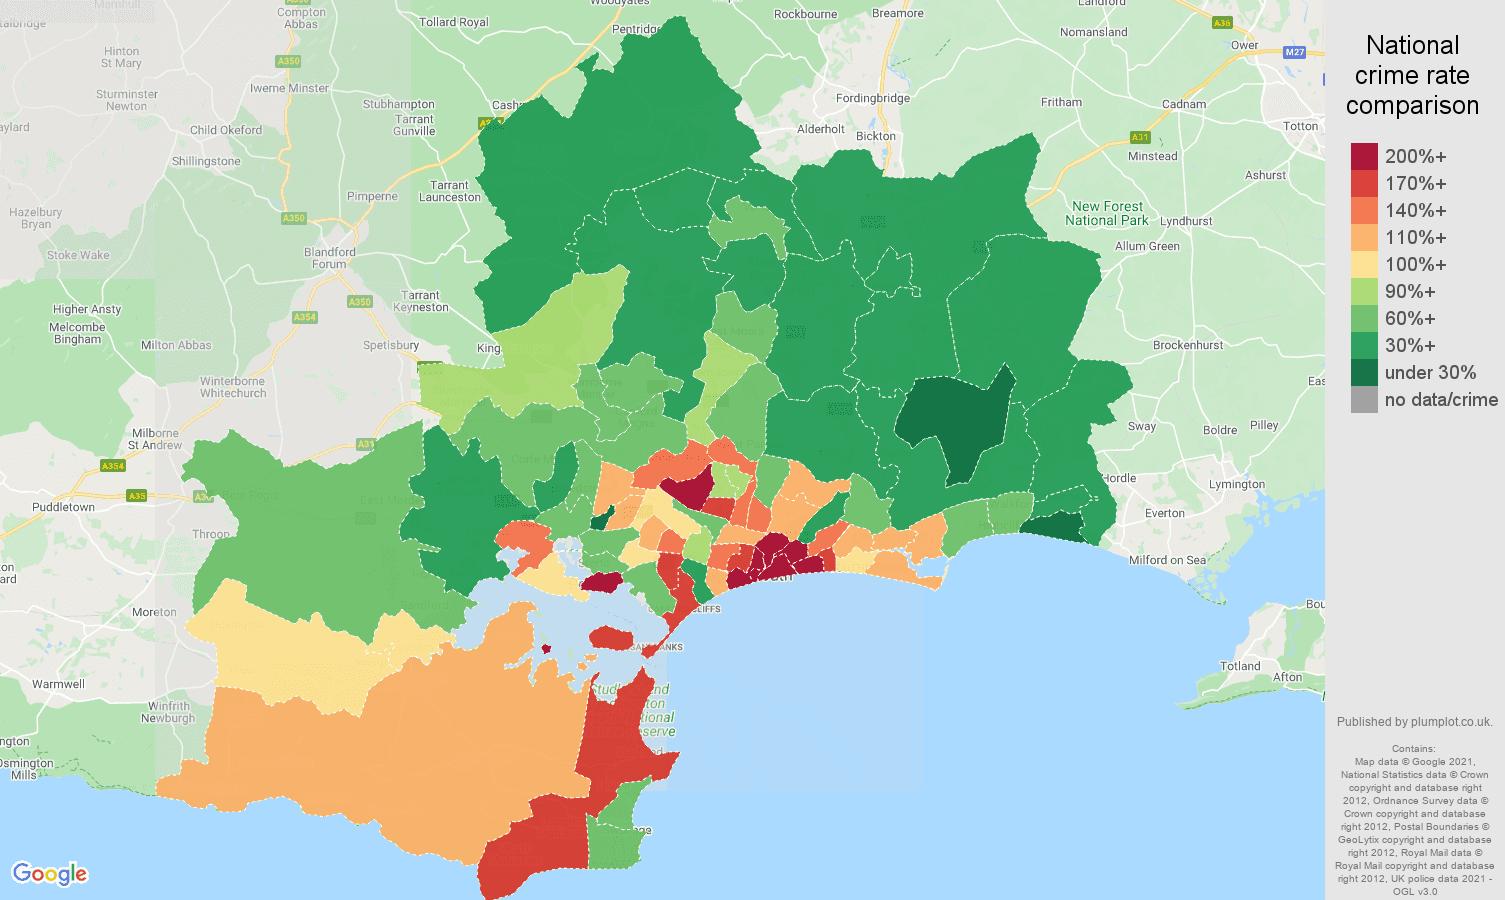 Bournemouth antisocial behaviour crime rate comparison map